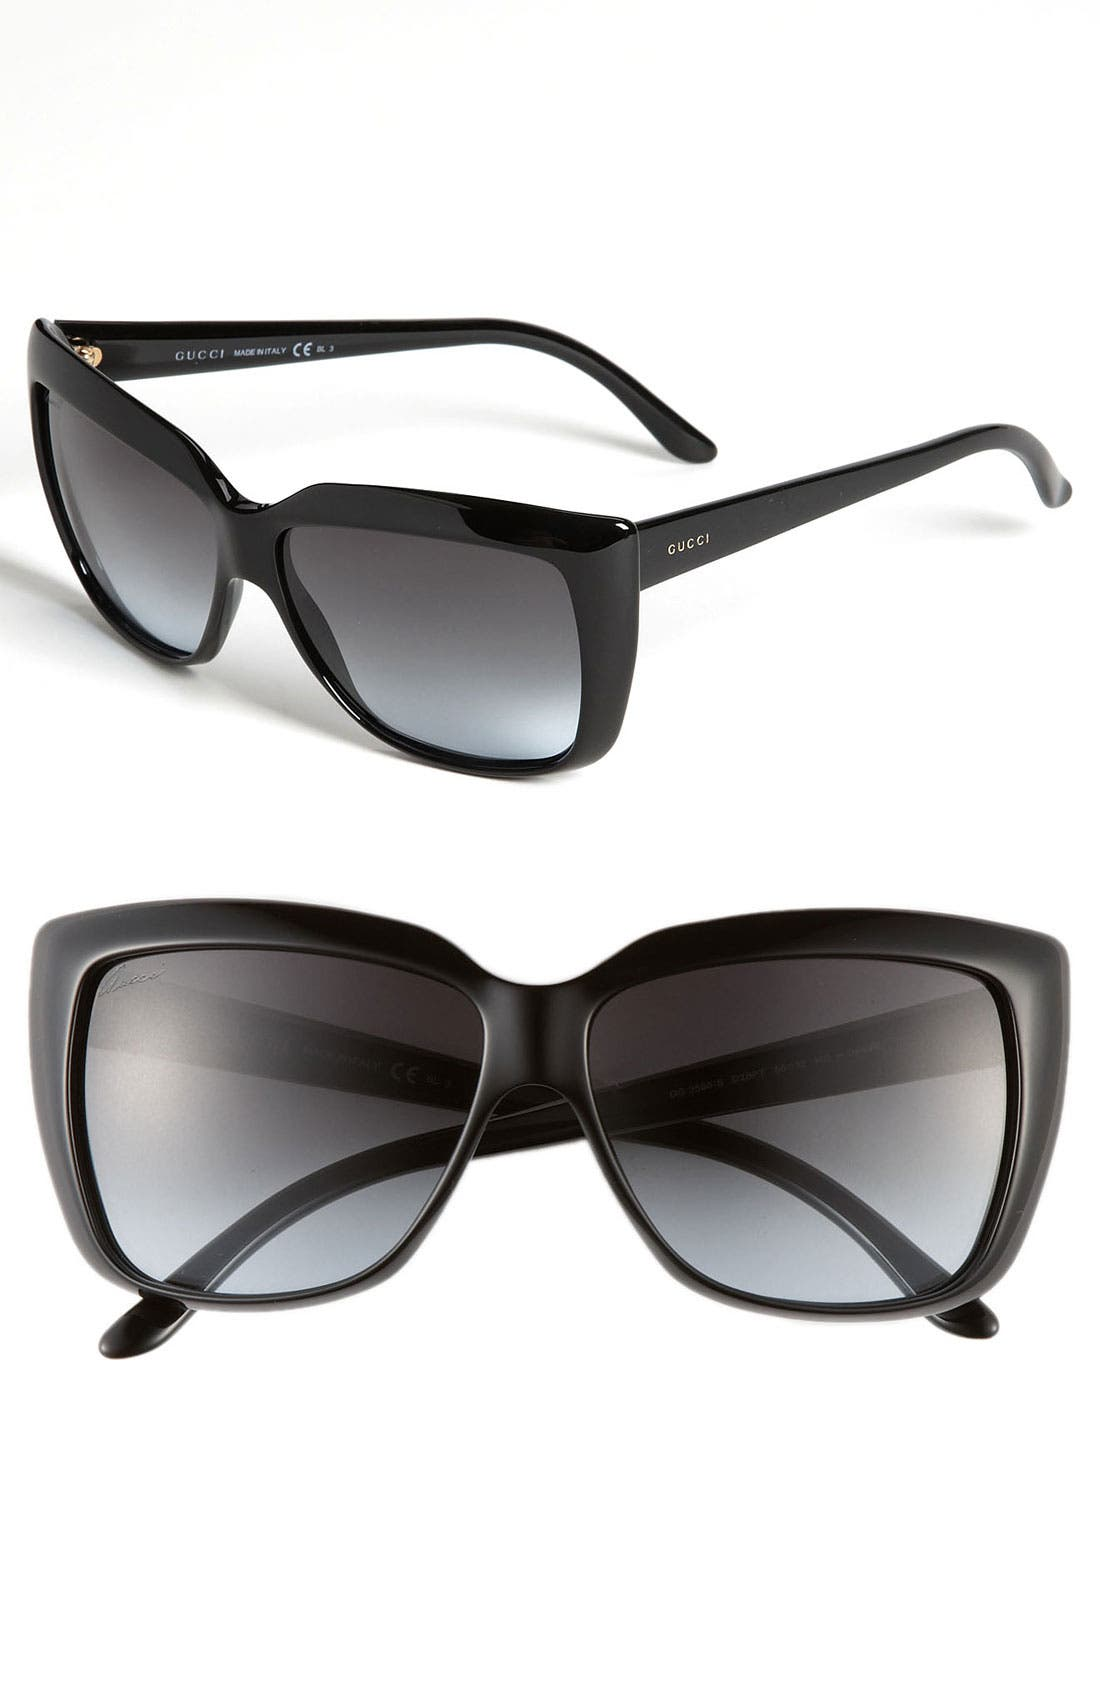 Alternate Image 1 Selected - Gucci 58mm Retro Sunglasses